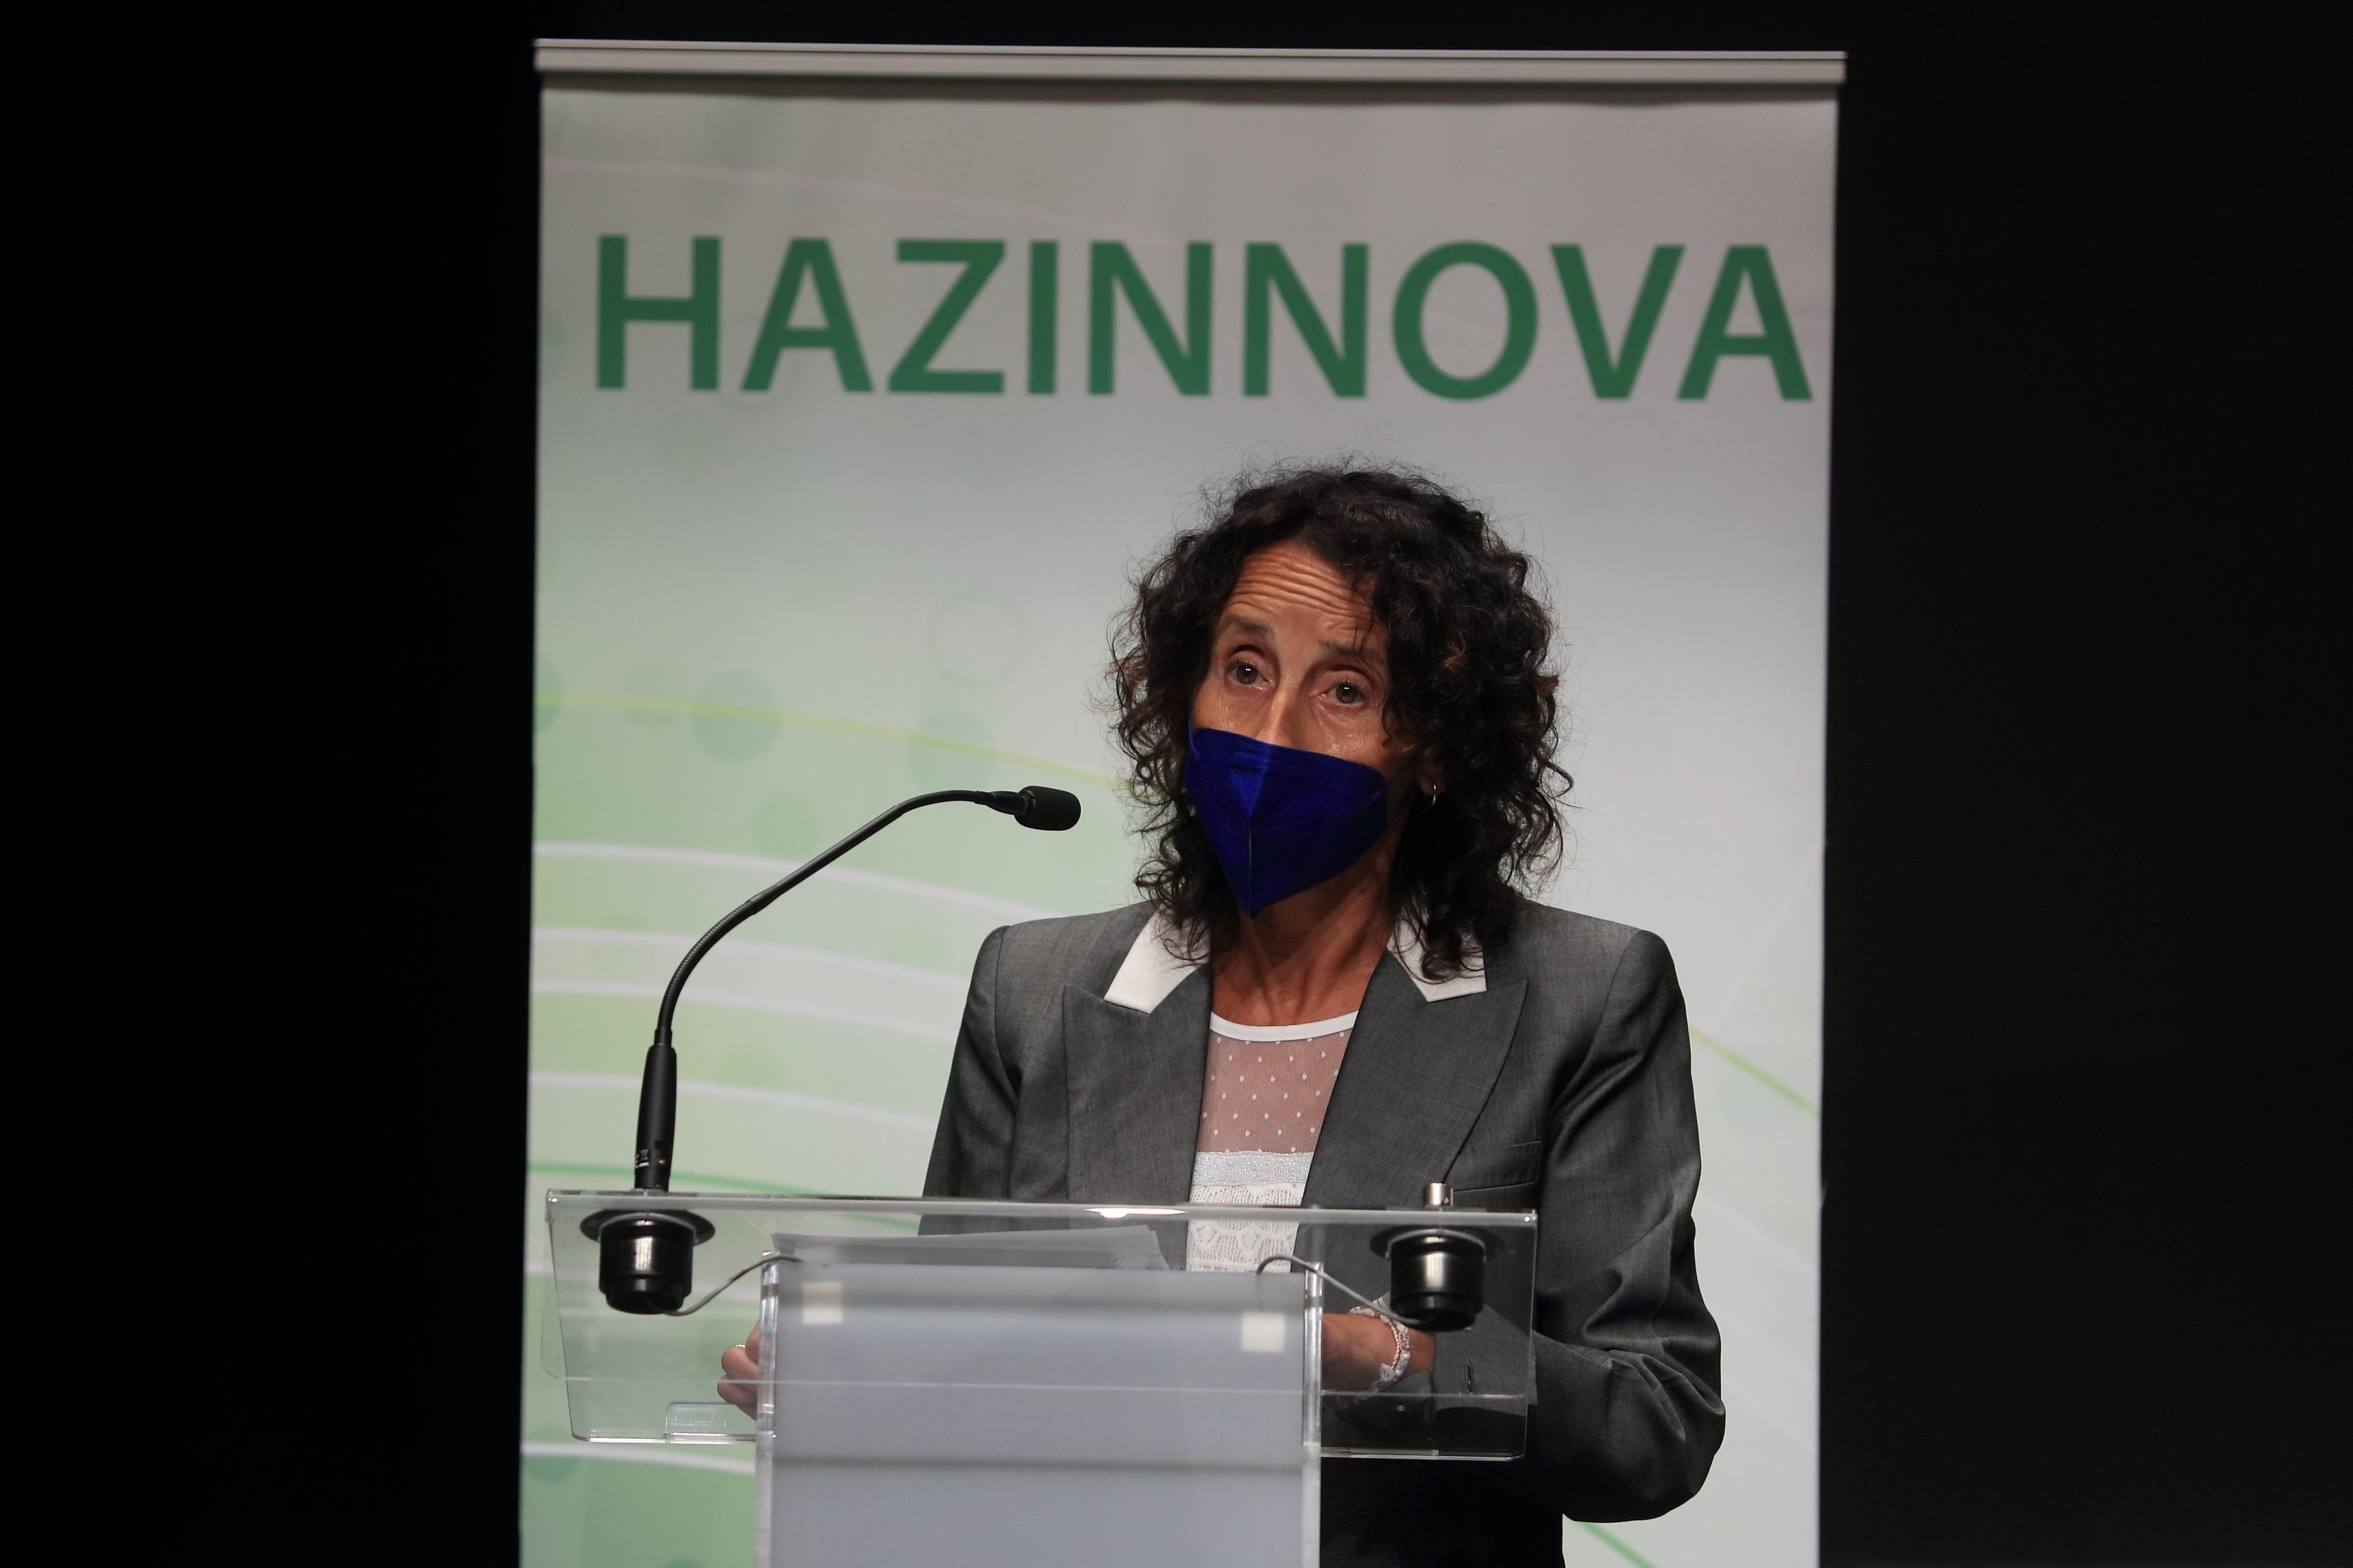 Hazinnova15.JPG